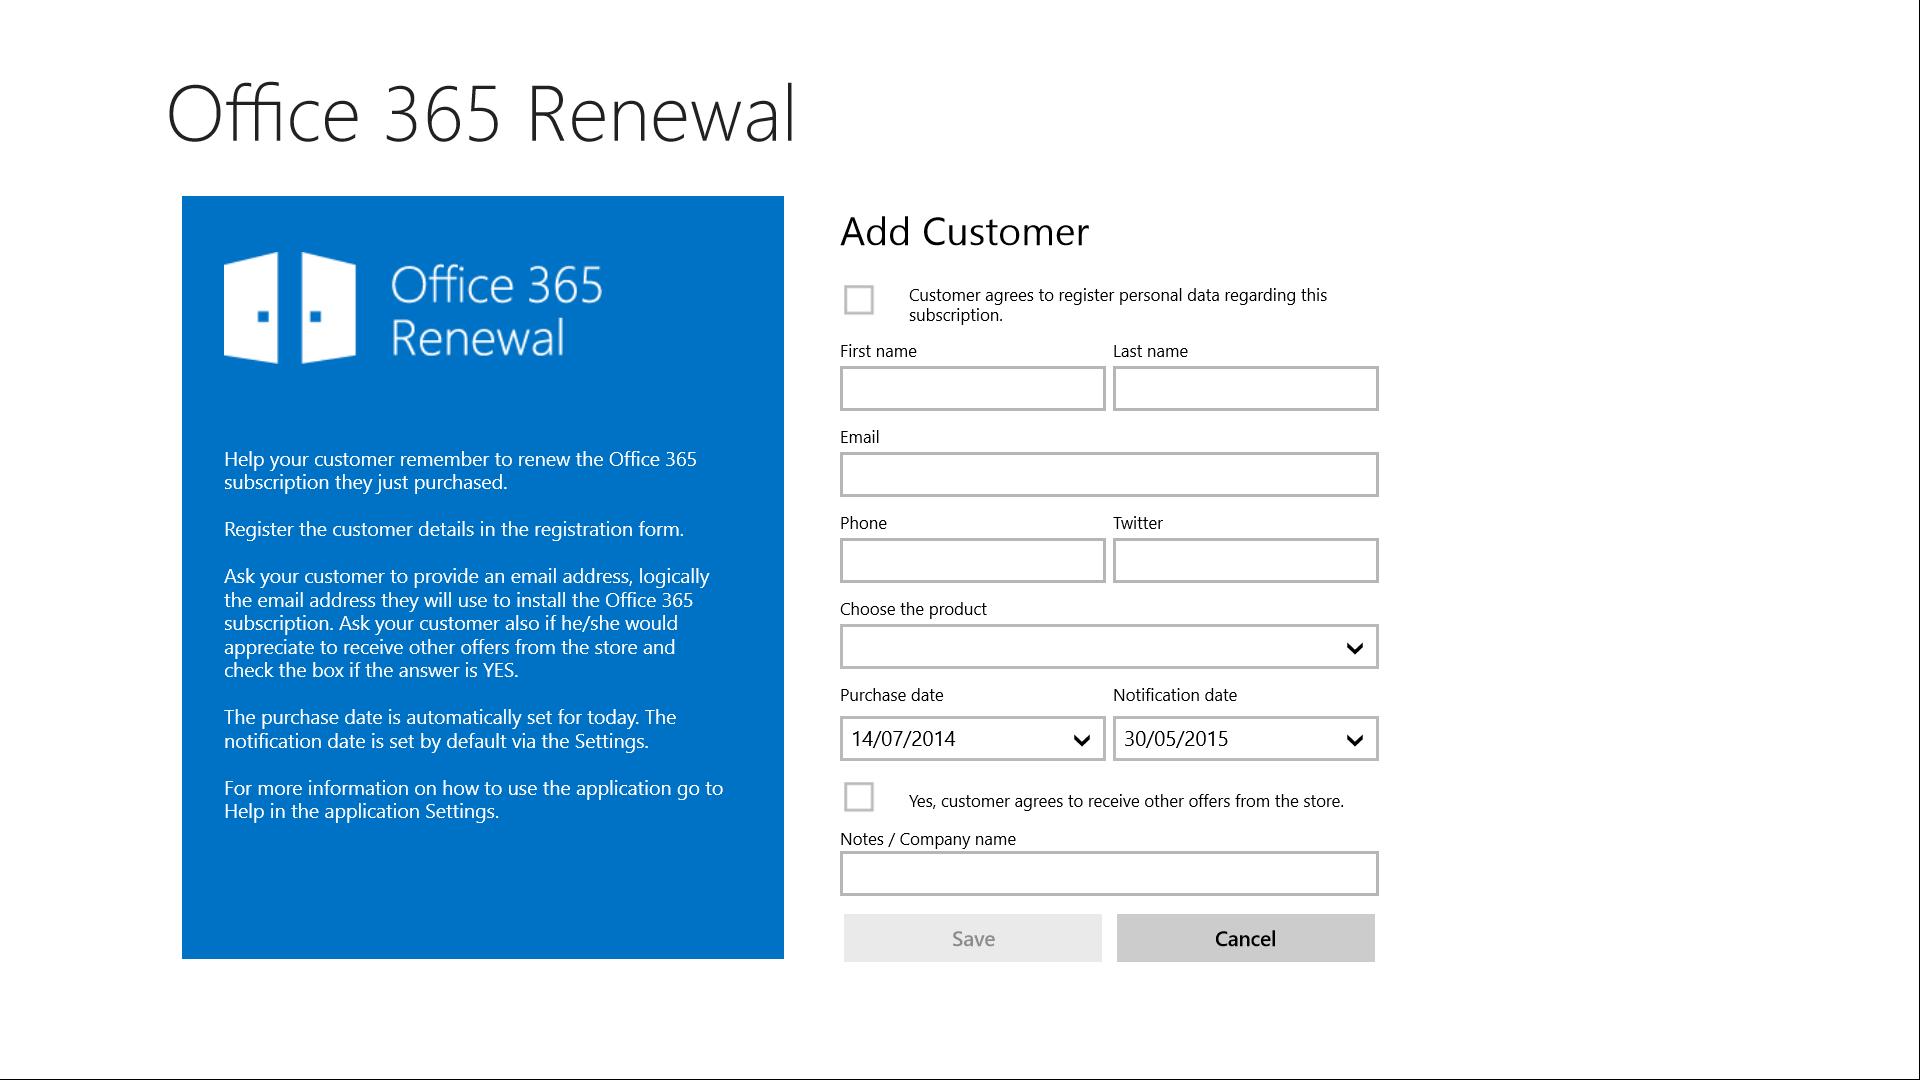 Office 365 Renewal - Microsoft Store